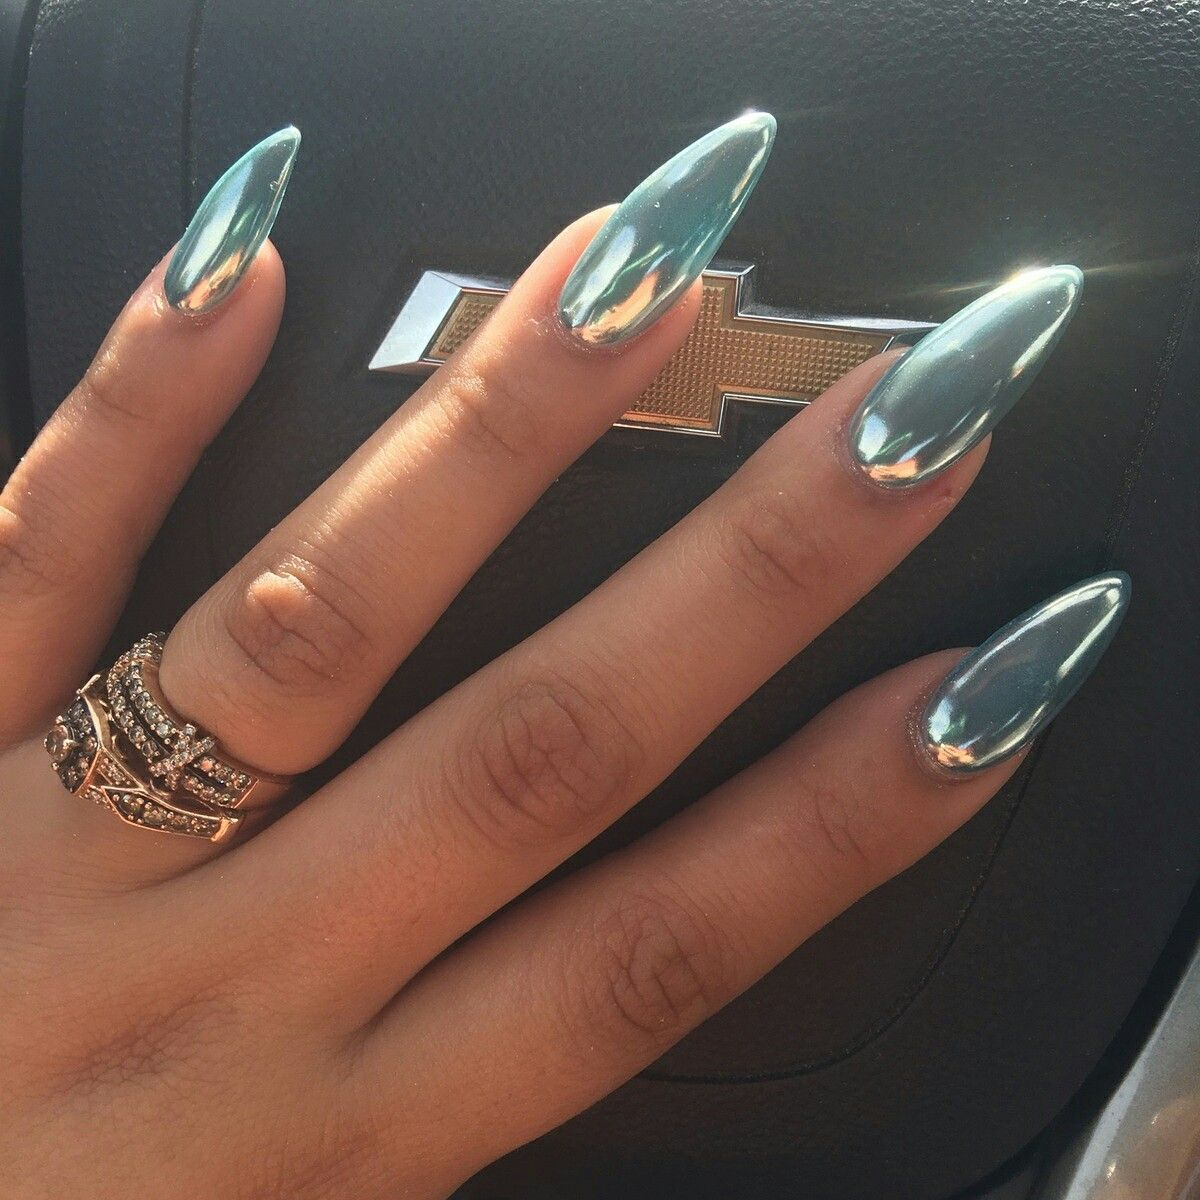 Acrylic nail salons near me - Chrome Nails